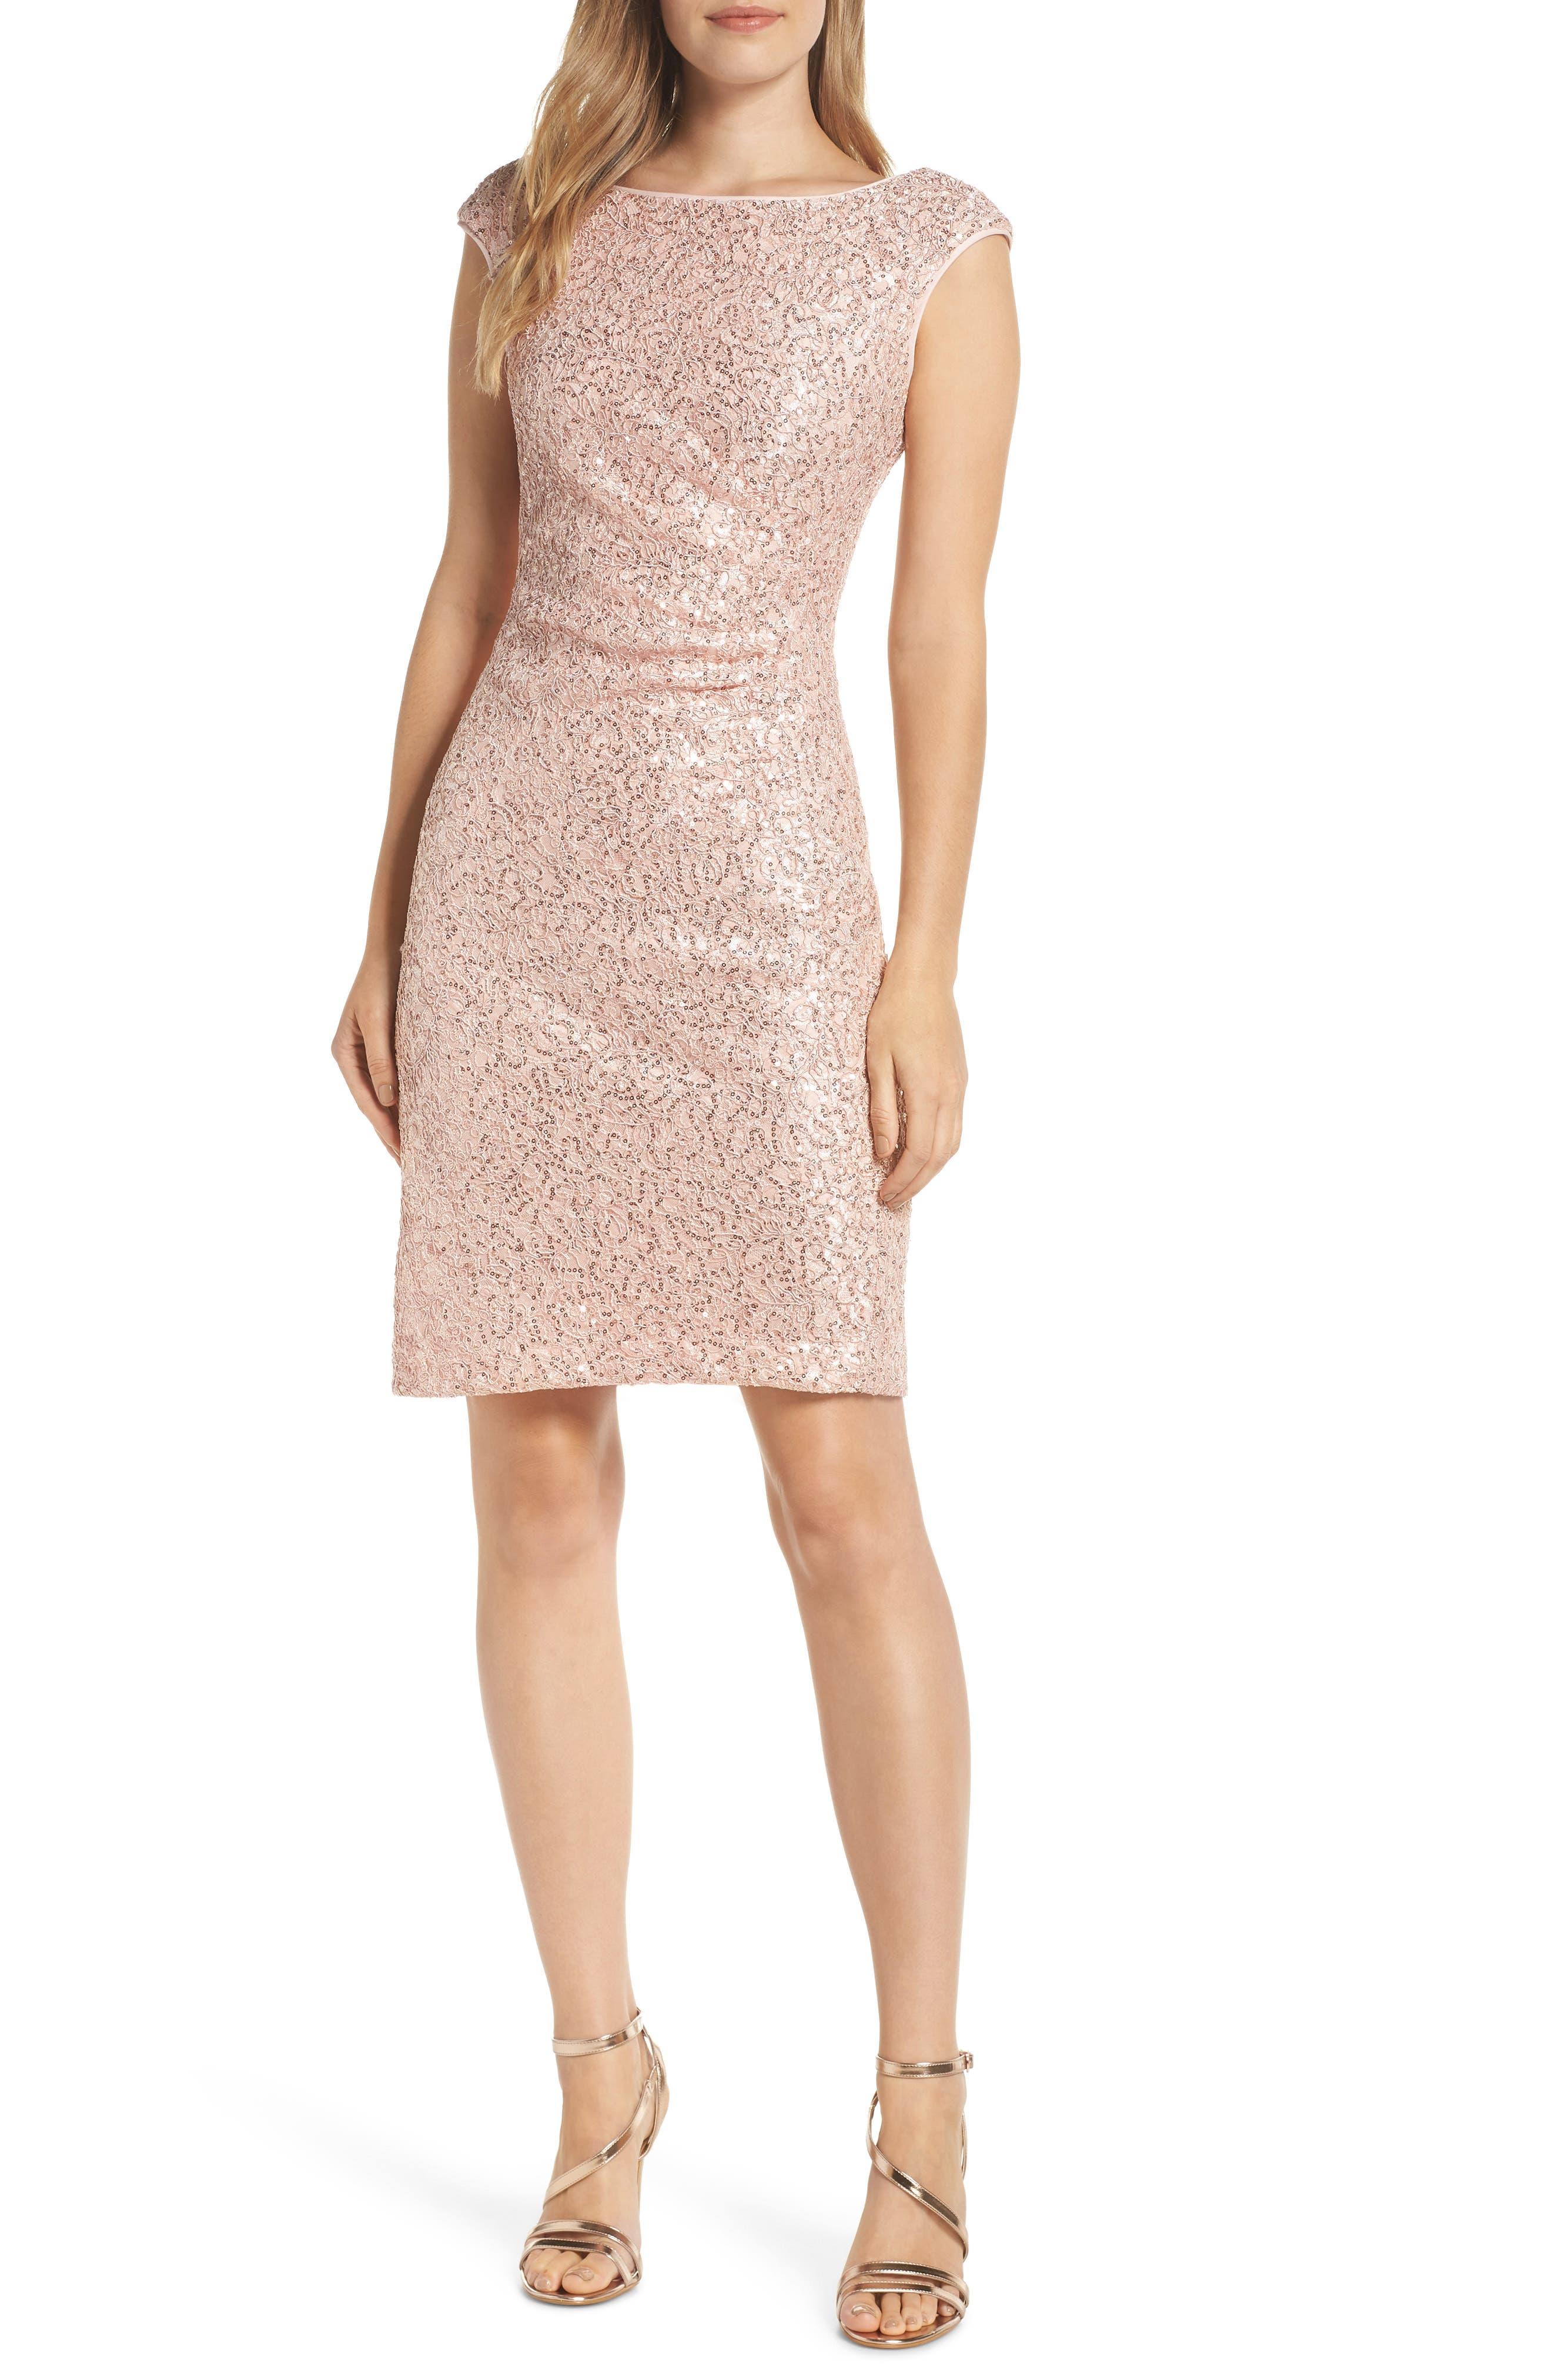 VINCE CAMUTO Sequin Lace Sheath Dress, Main, color, 684